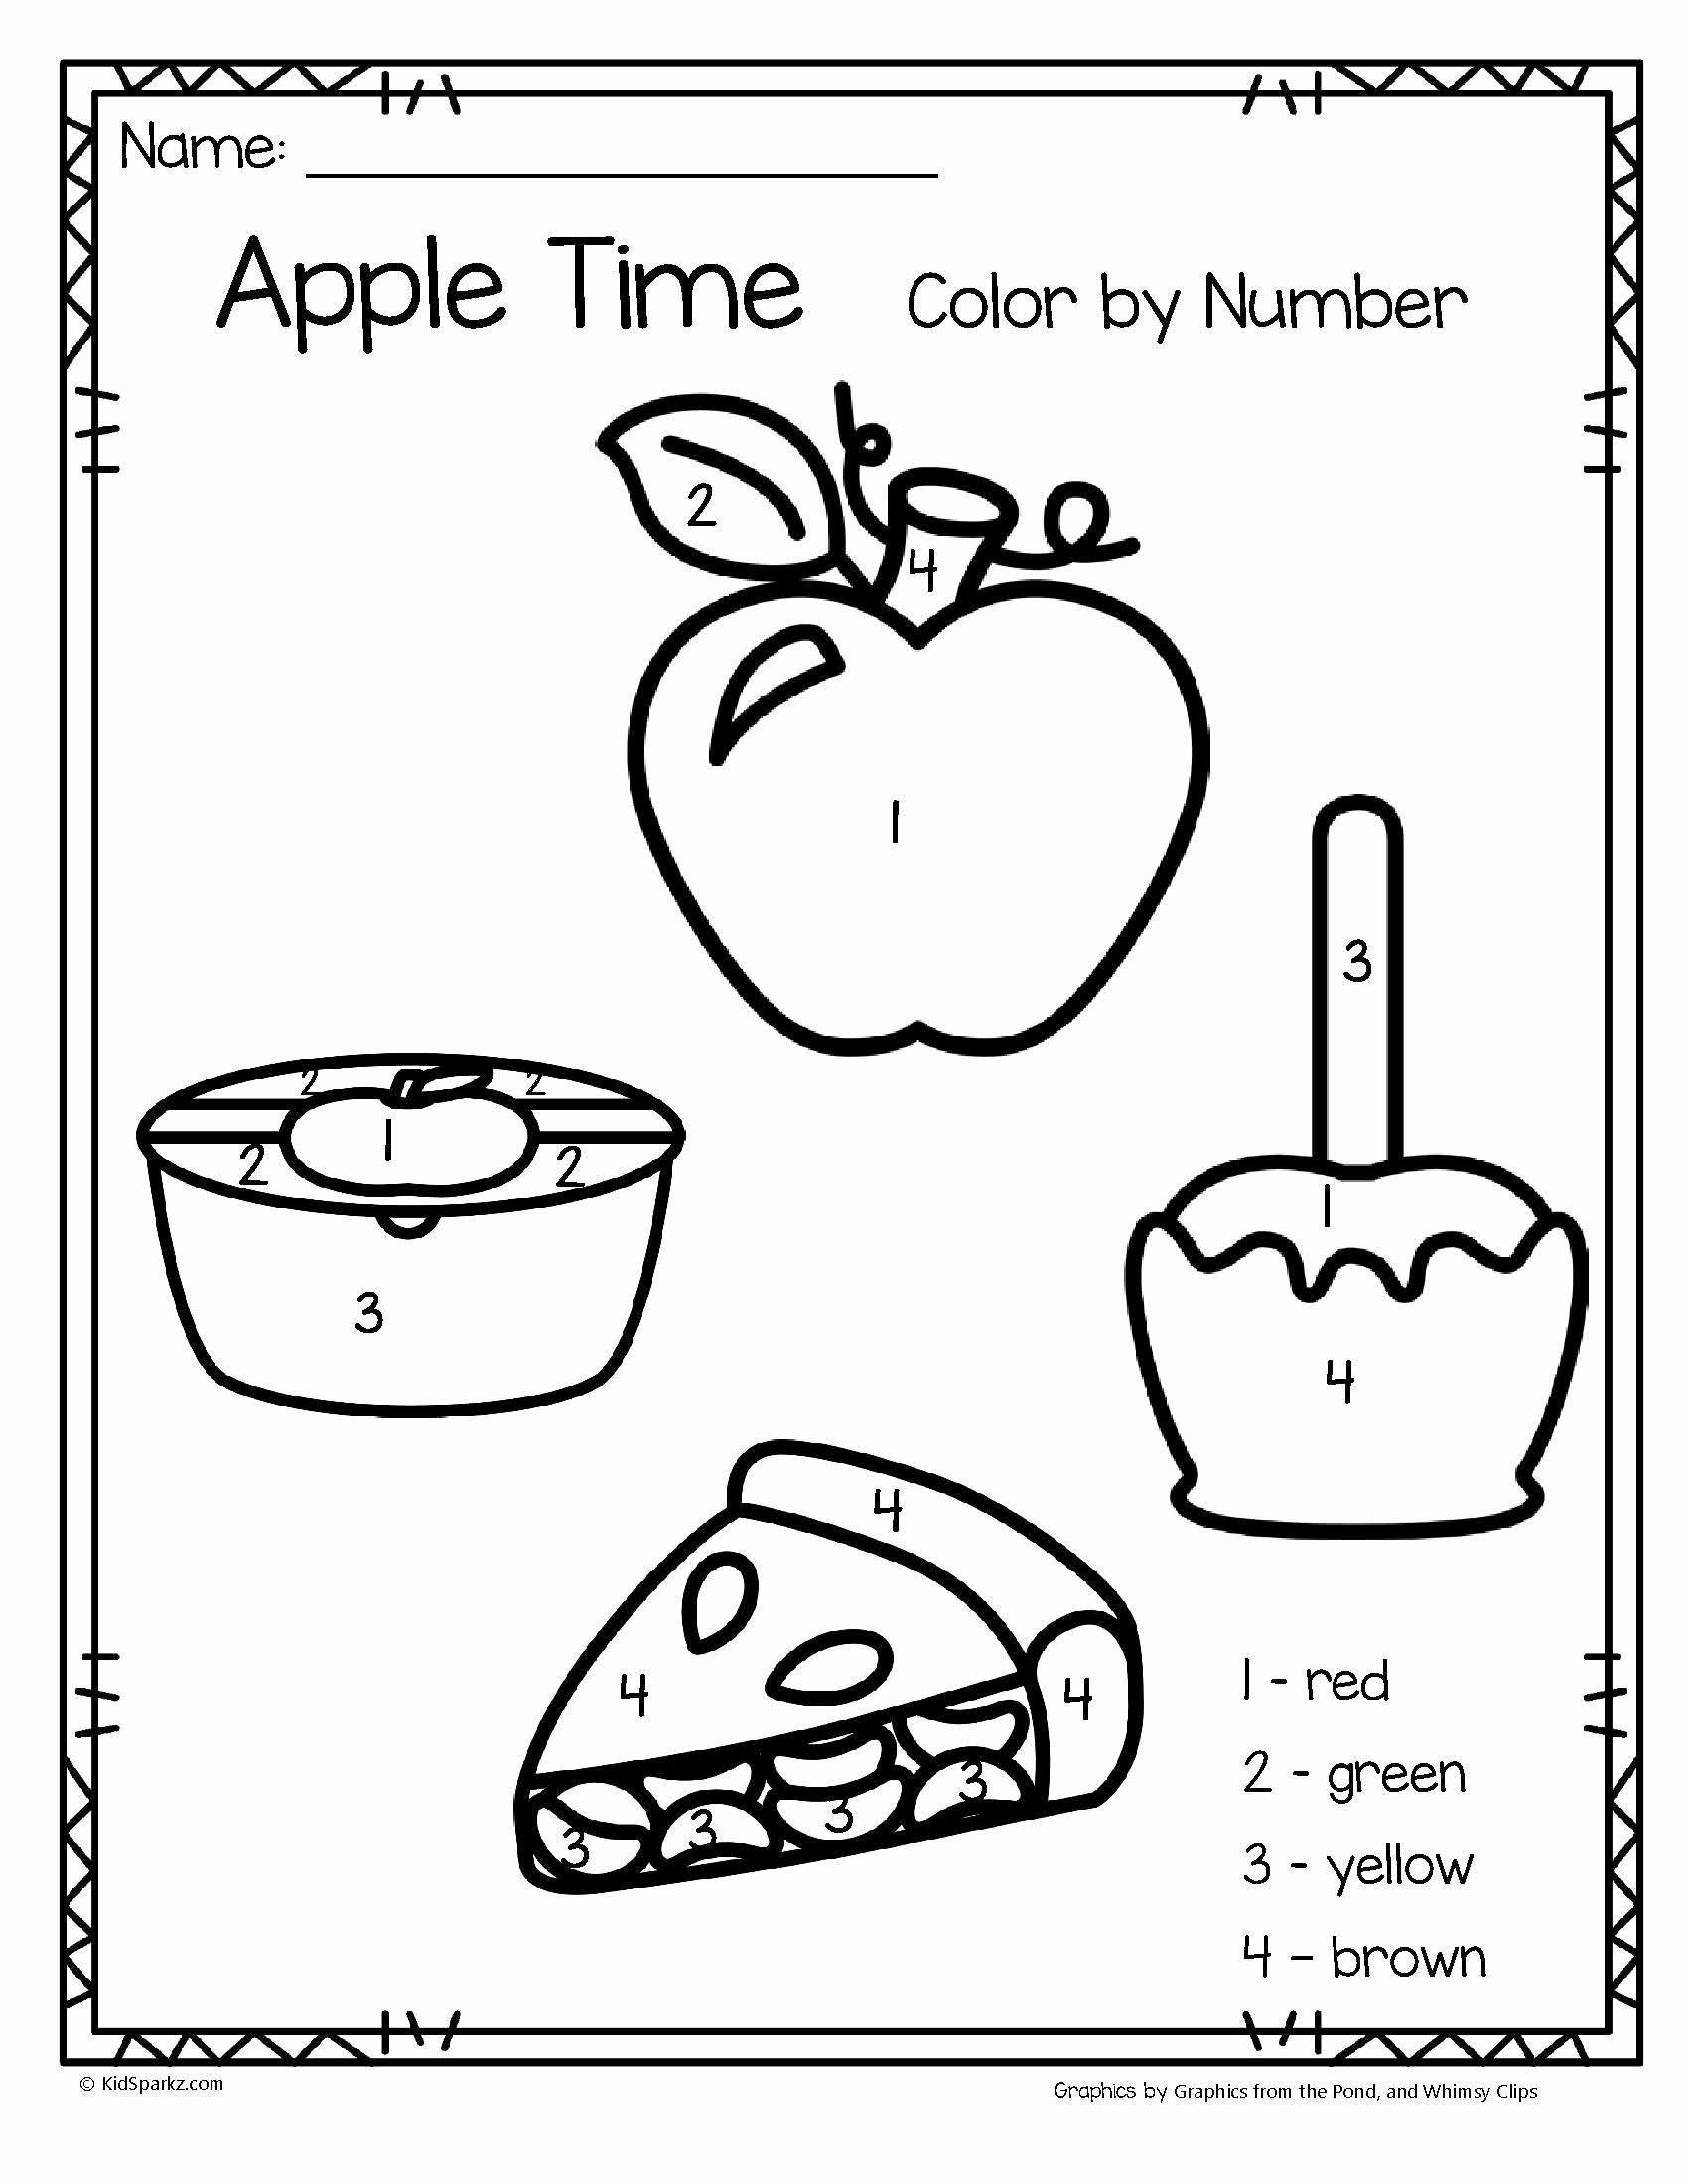 Apple Worksheets for Preschoolers New Worksheets Printable Number Coloring for toddlers Pdf